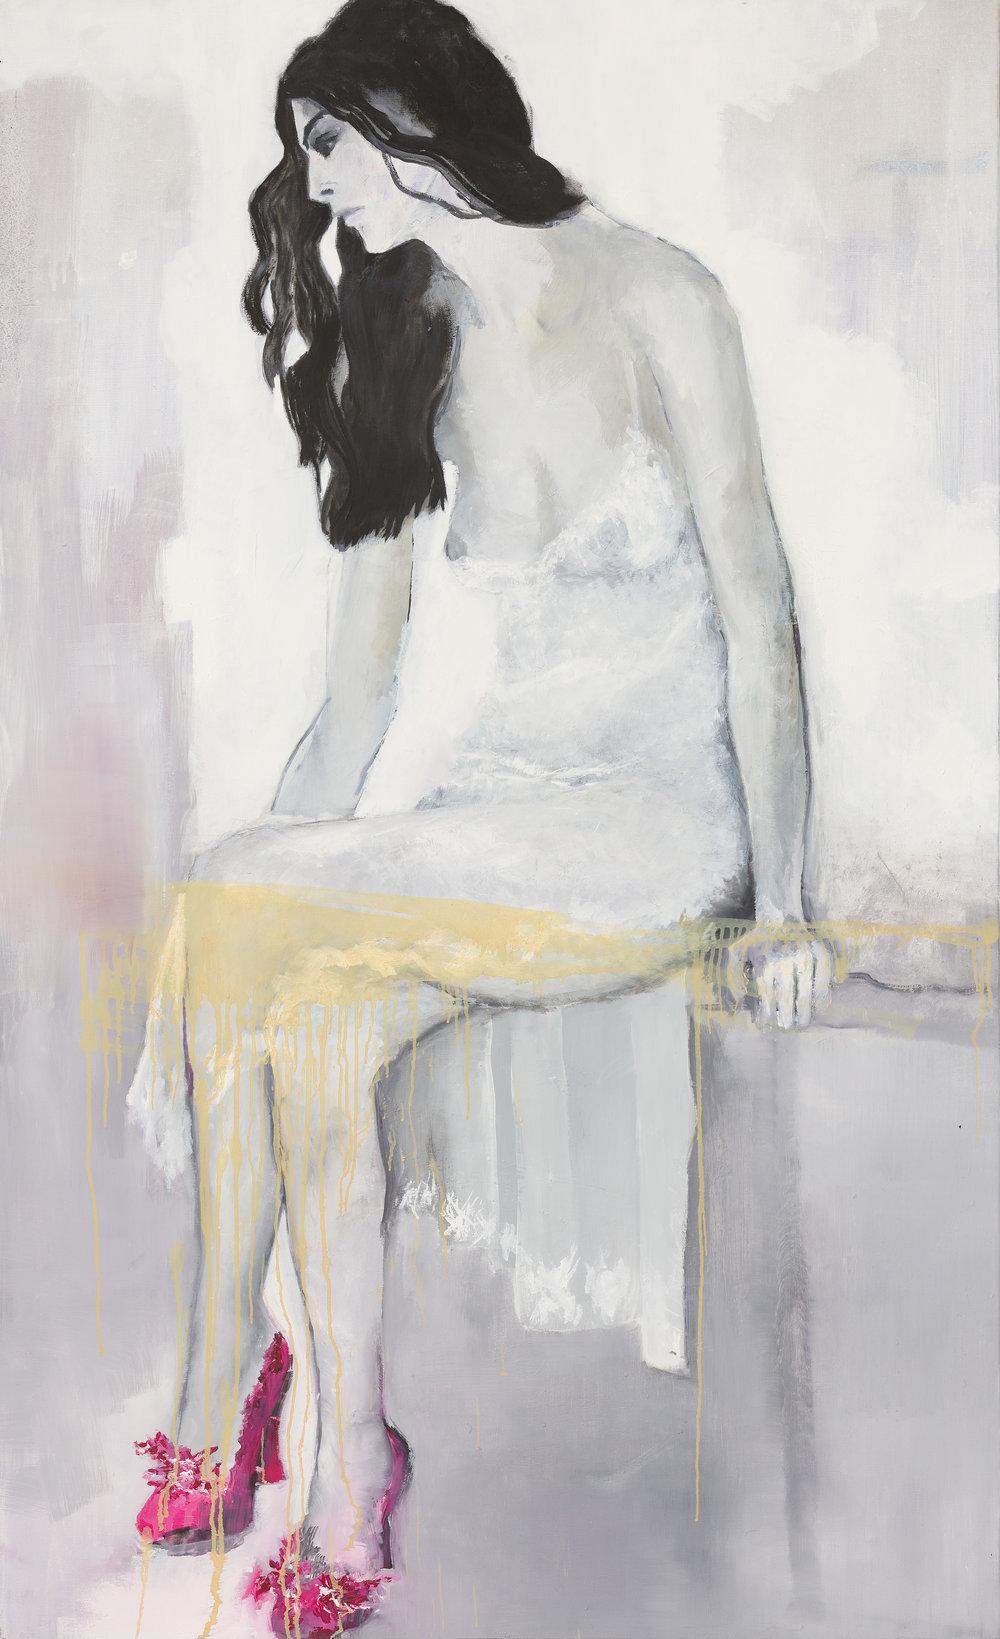 2012, Les chaussons roses, 150 x 90 cm.jpg